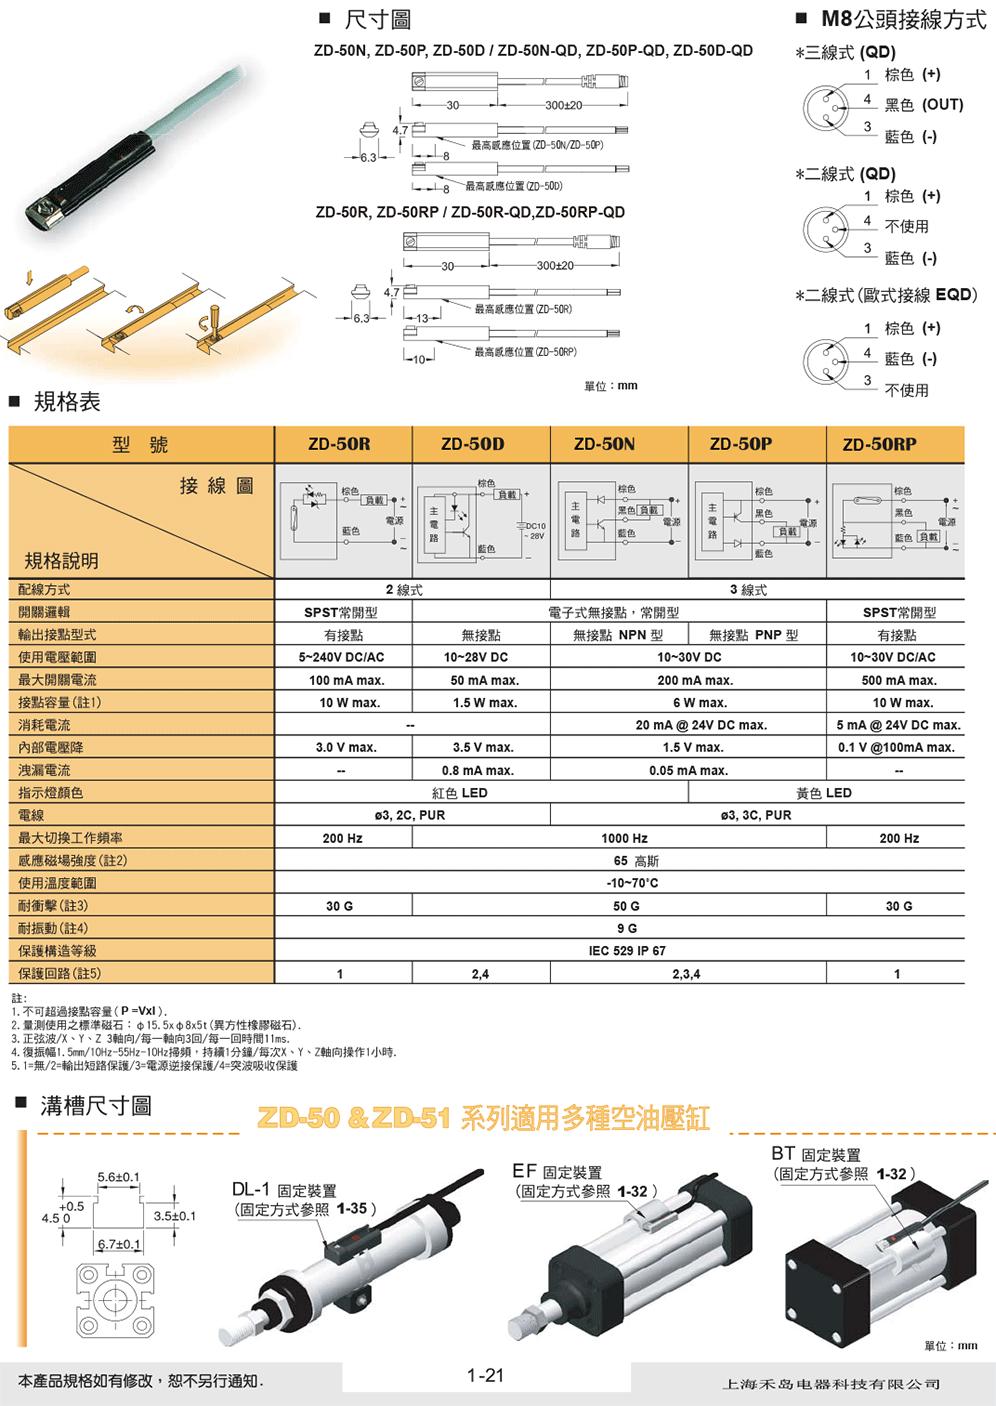 ZD-50系列 磁性开关